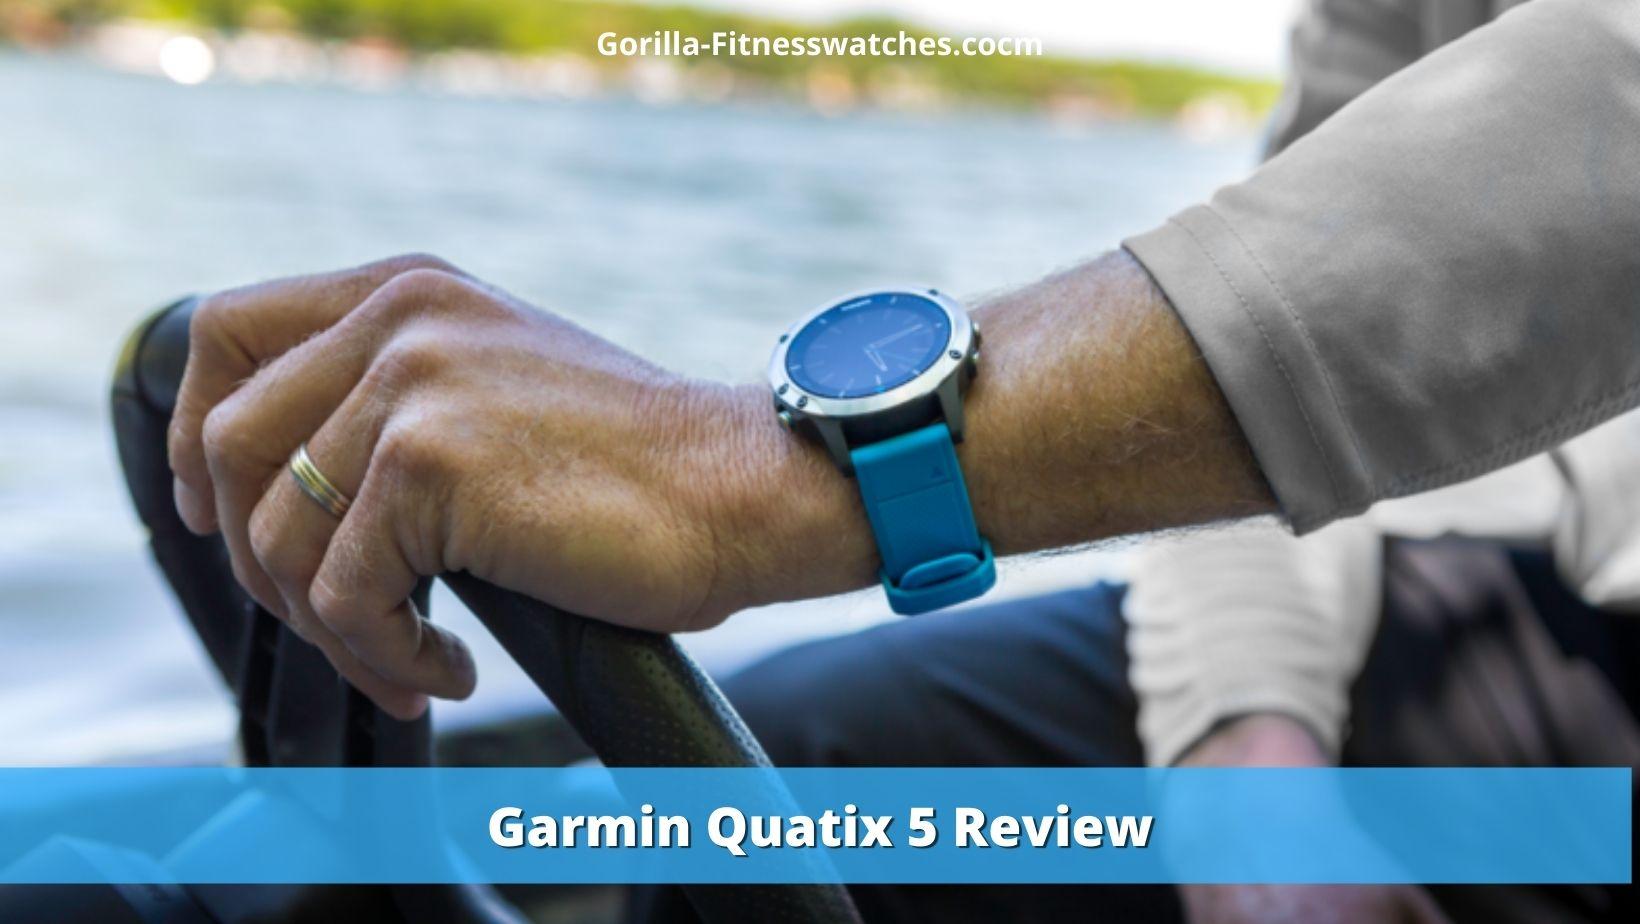 Garmin Quatix 5 Review: